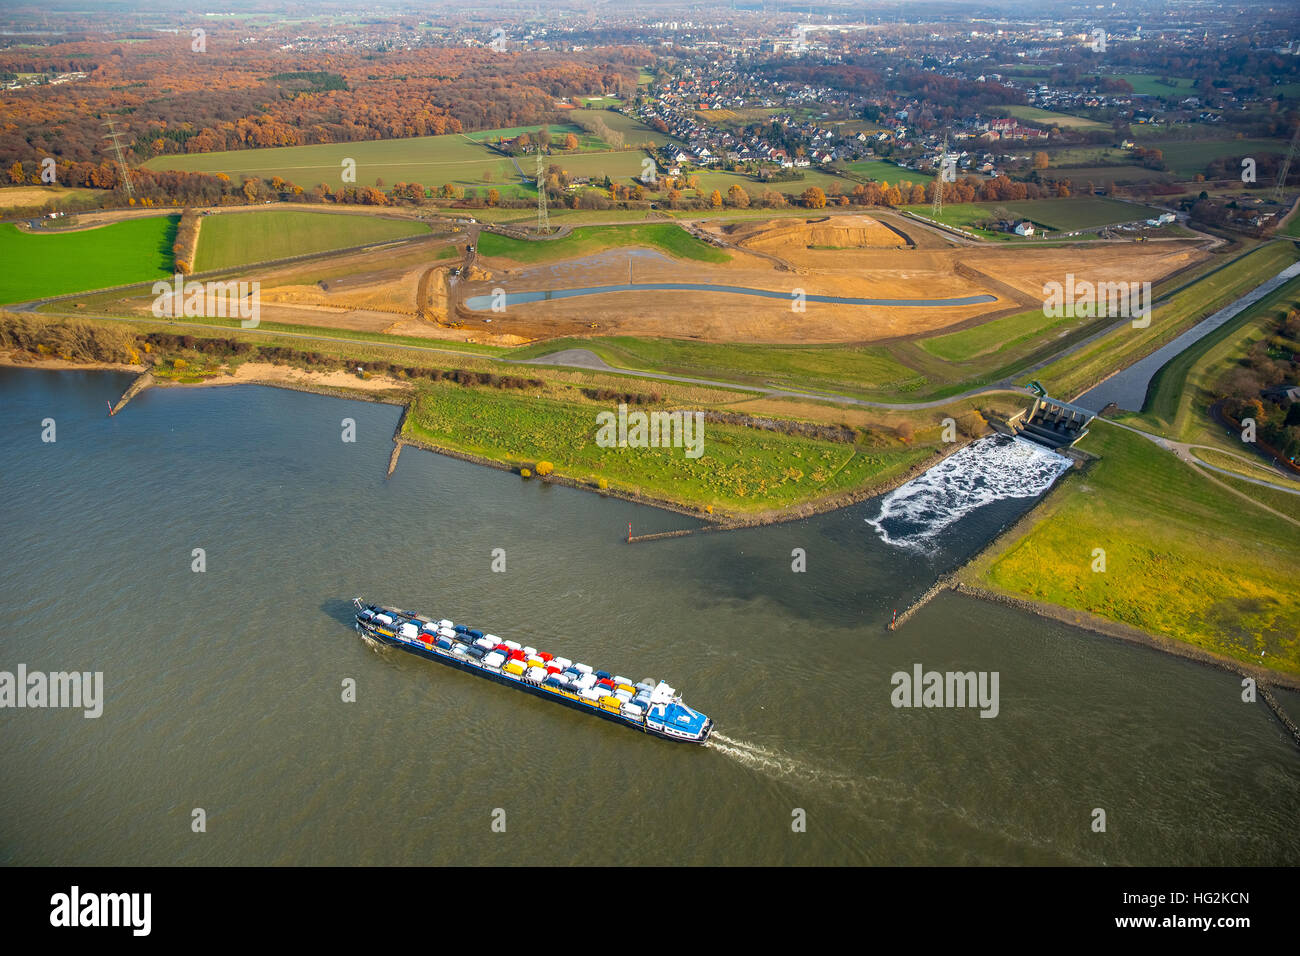 Aerial view, Emscher estuary, Rhine meadows, Dinslaken, Rhine, reconstruction of Emscher mouth, Dinslaken, Ruhr - Stock Image